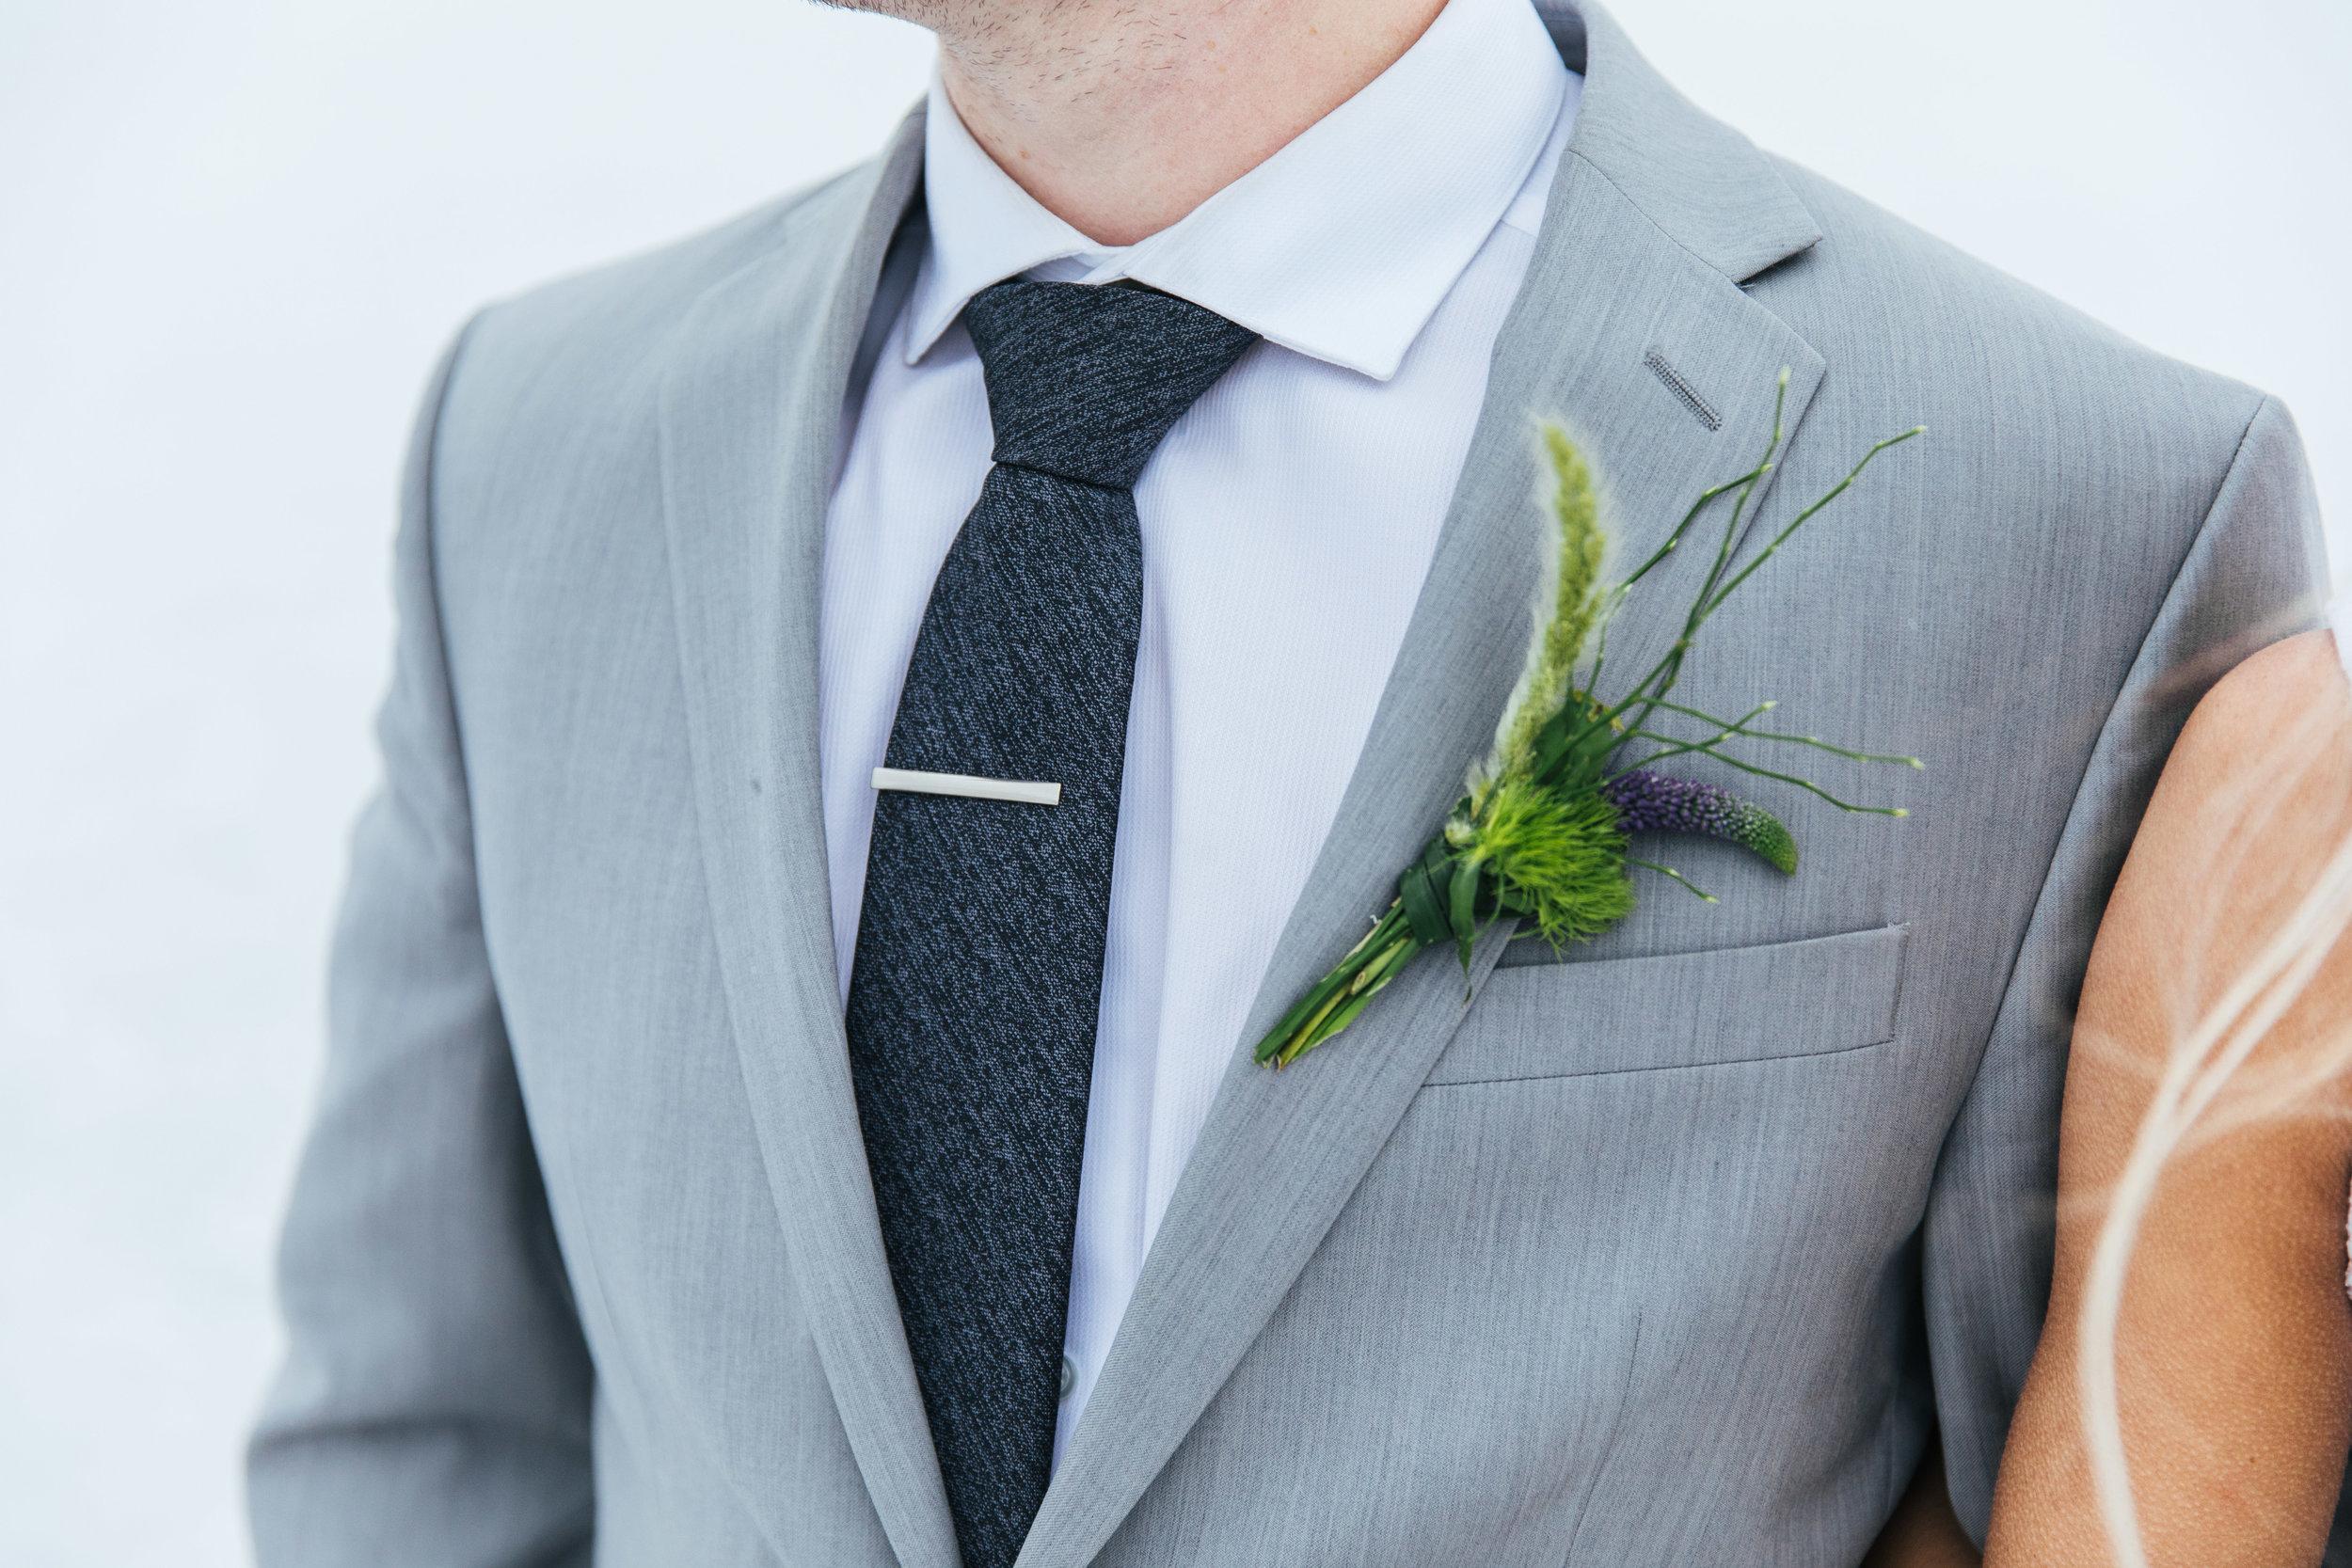 Utah adventure wedding photographers Kyle Loves Tori